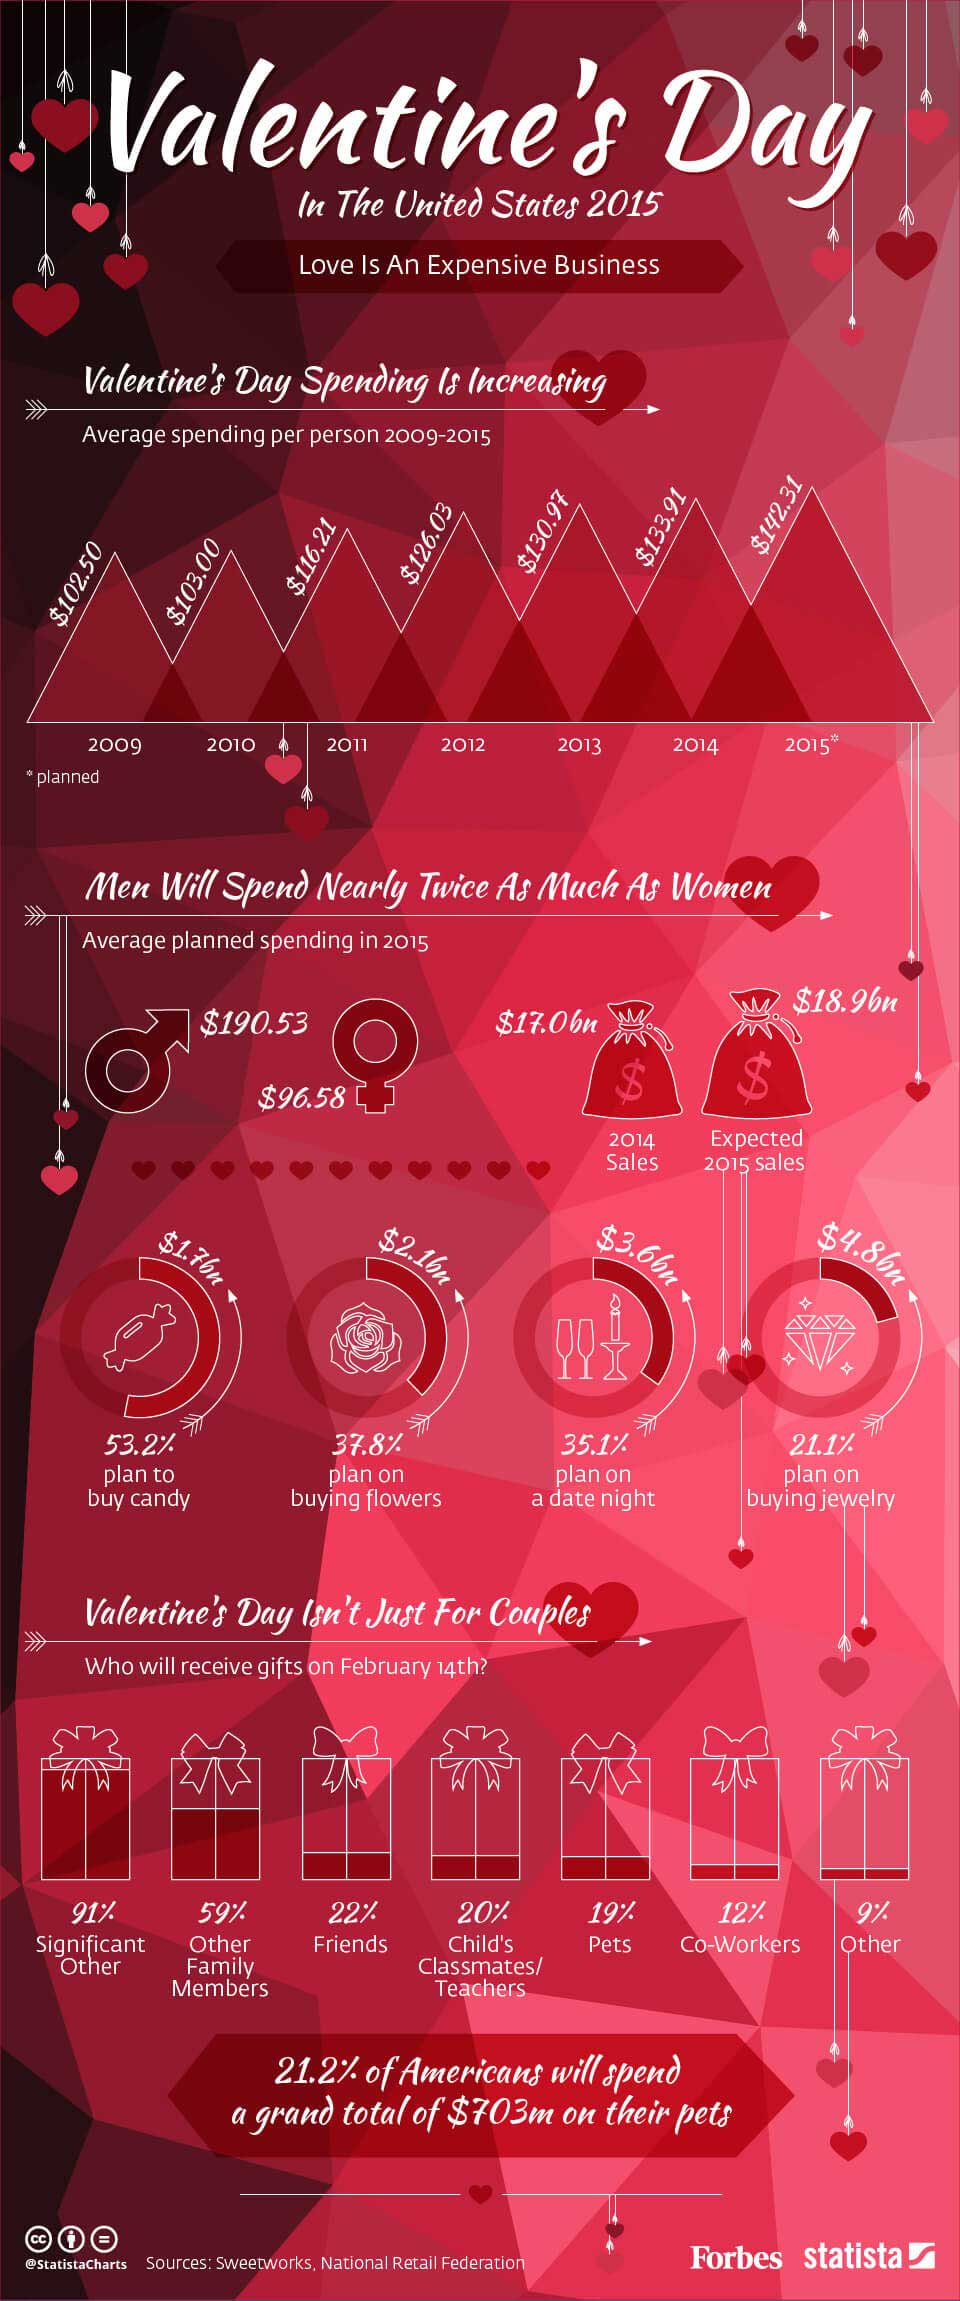 Valentine's Day- History